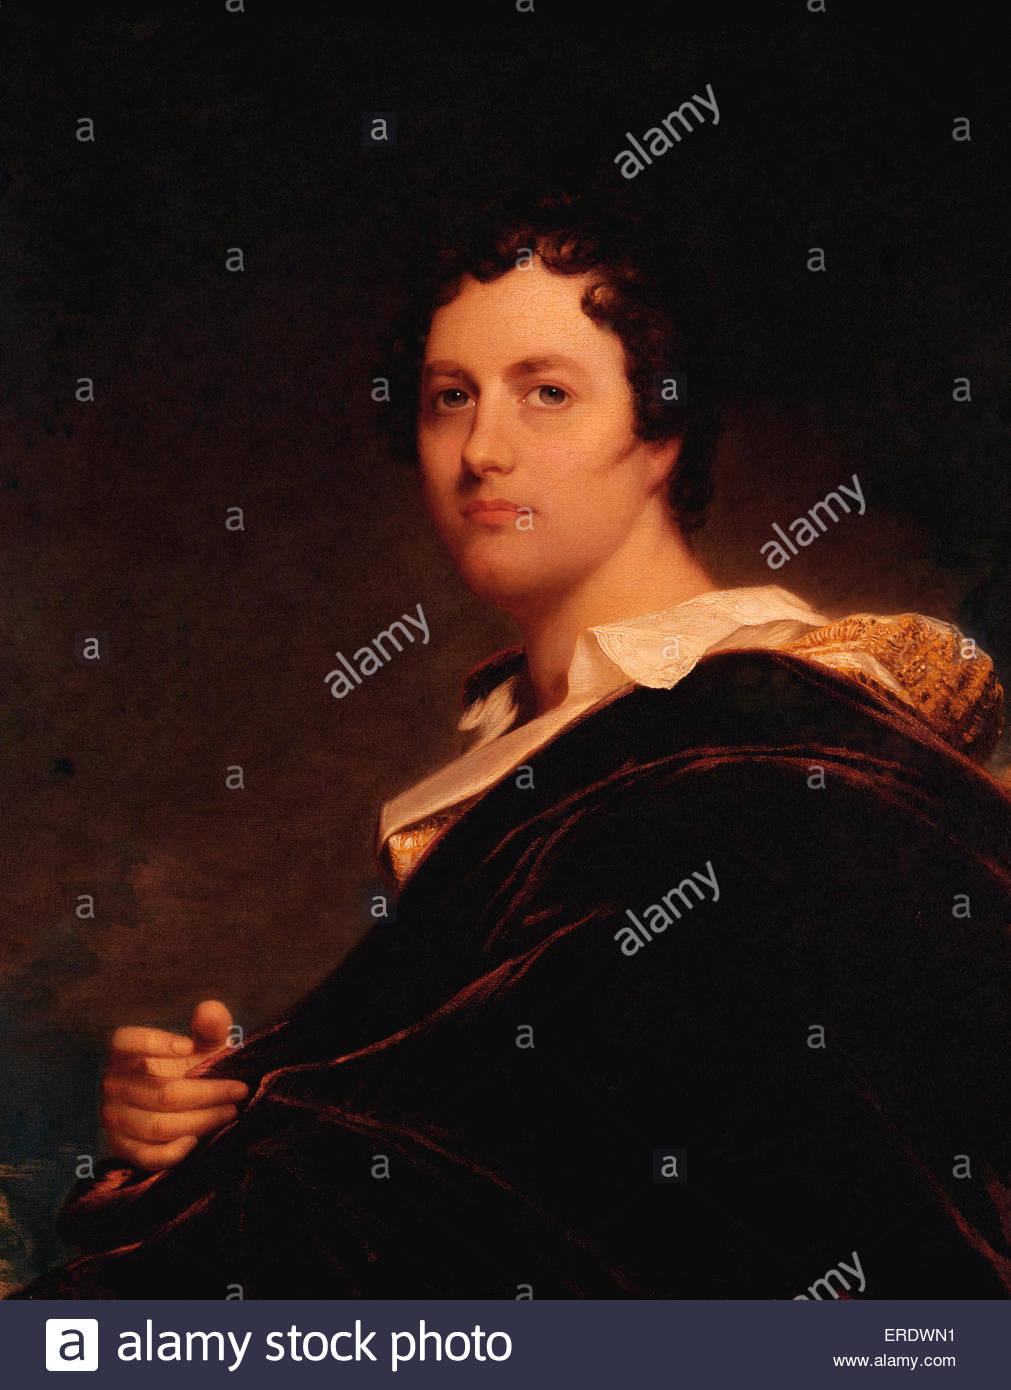 Lord Byron Ölgemälde von W E West. George Gordon Byron, 6. Baron Byron. Britischer Dichter 22. Januar Stockbild